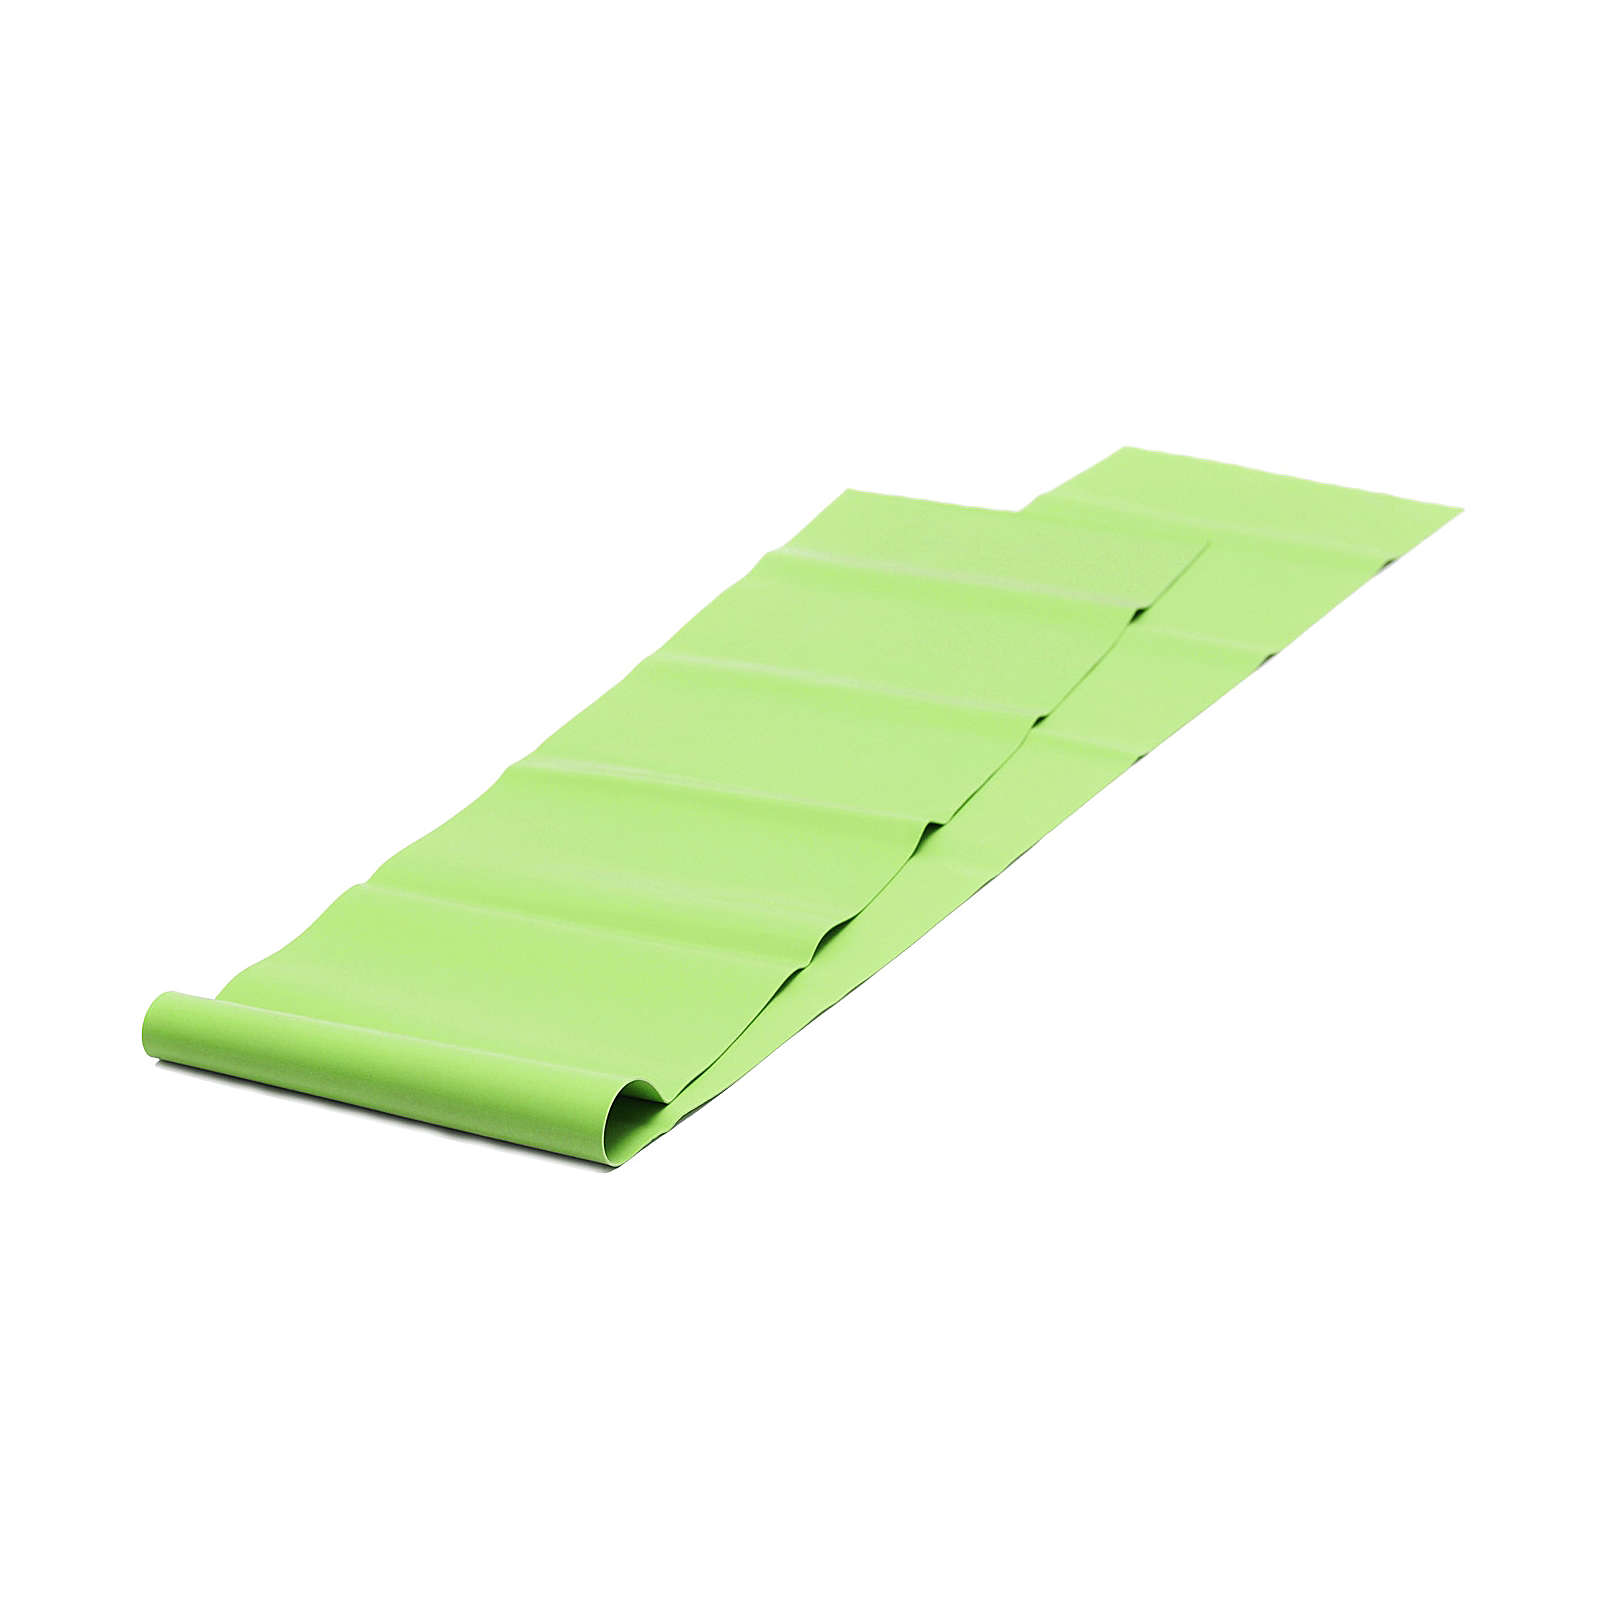 Yogistar Pilates Stretchband - latexfrei Fitnesszubehör grün